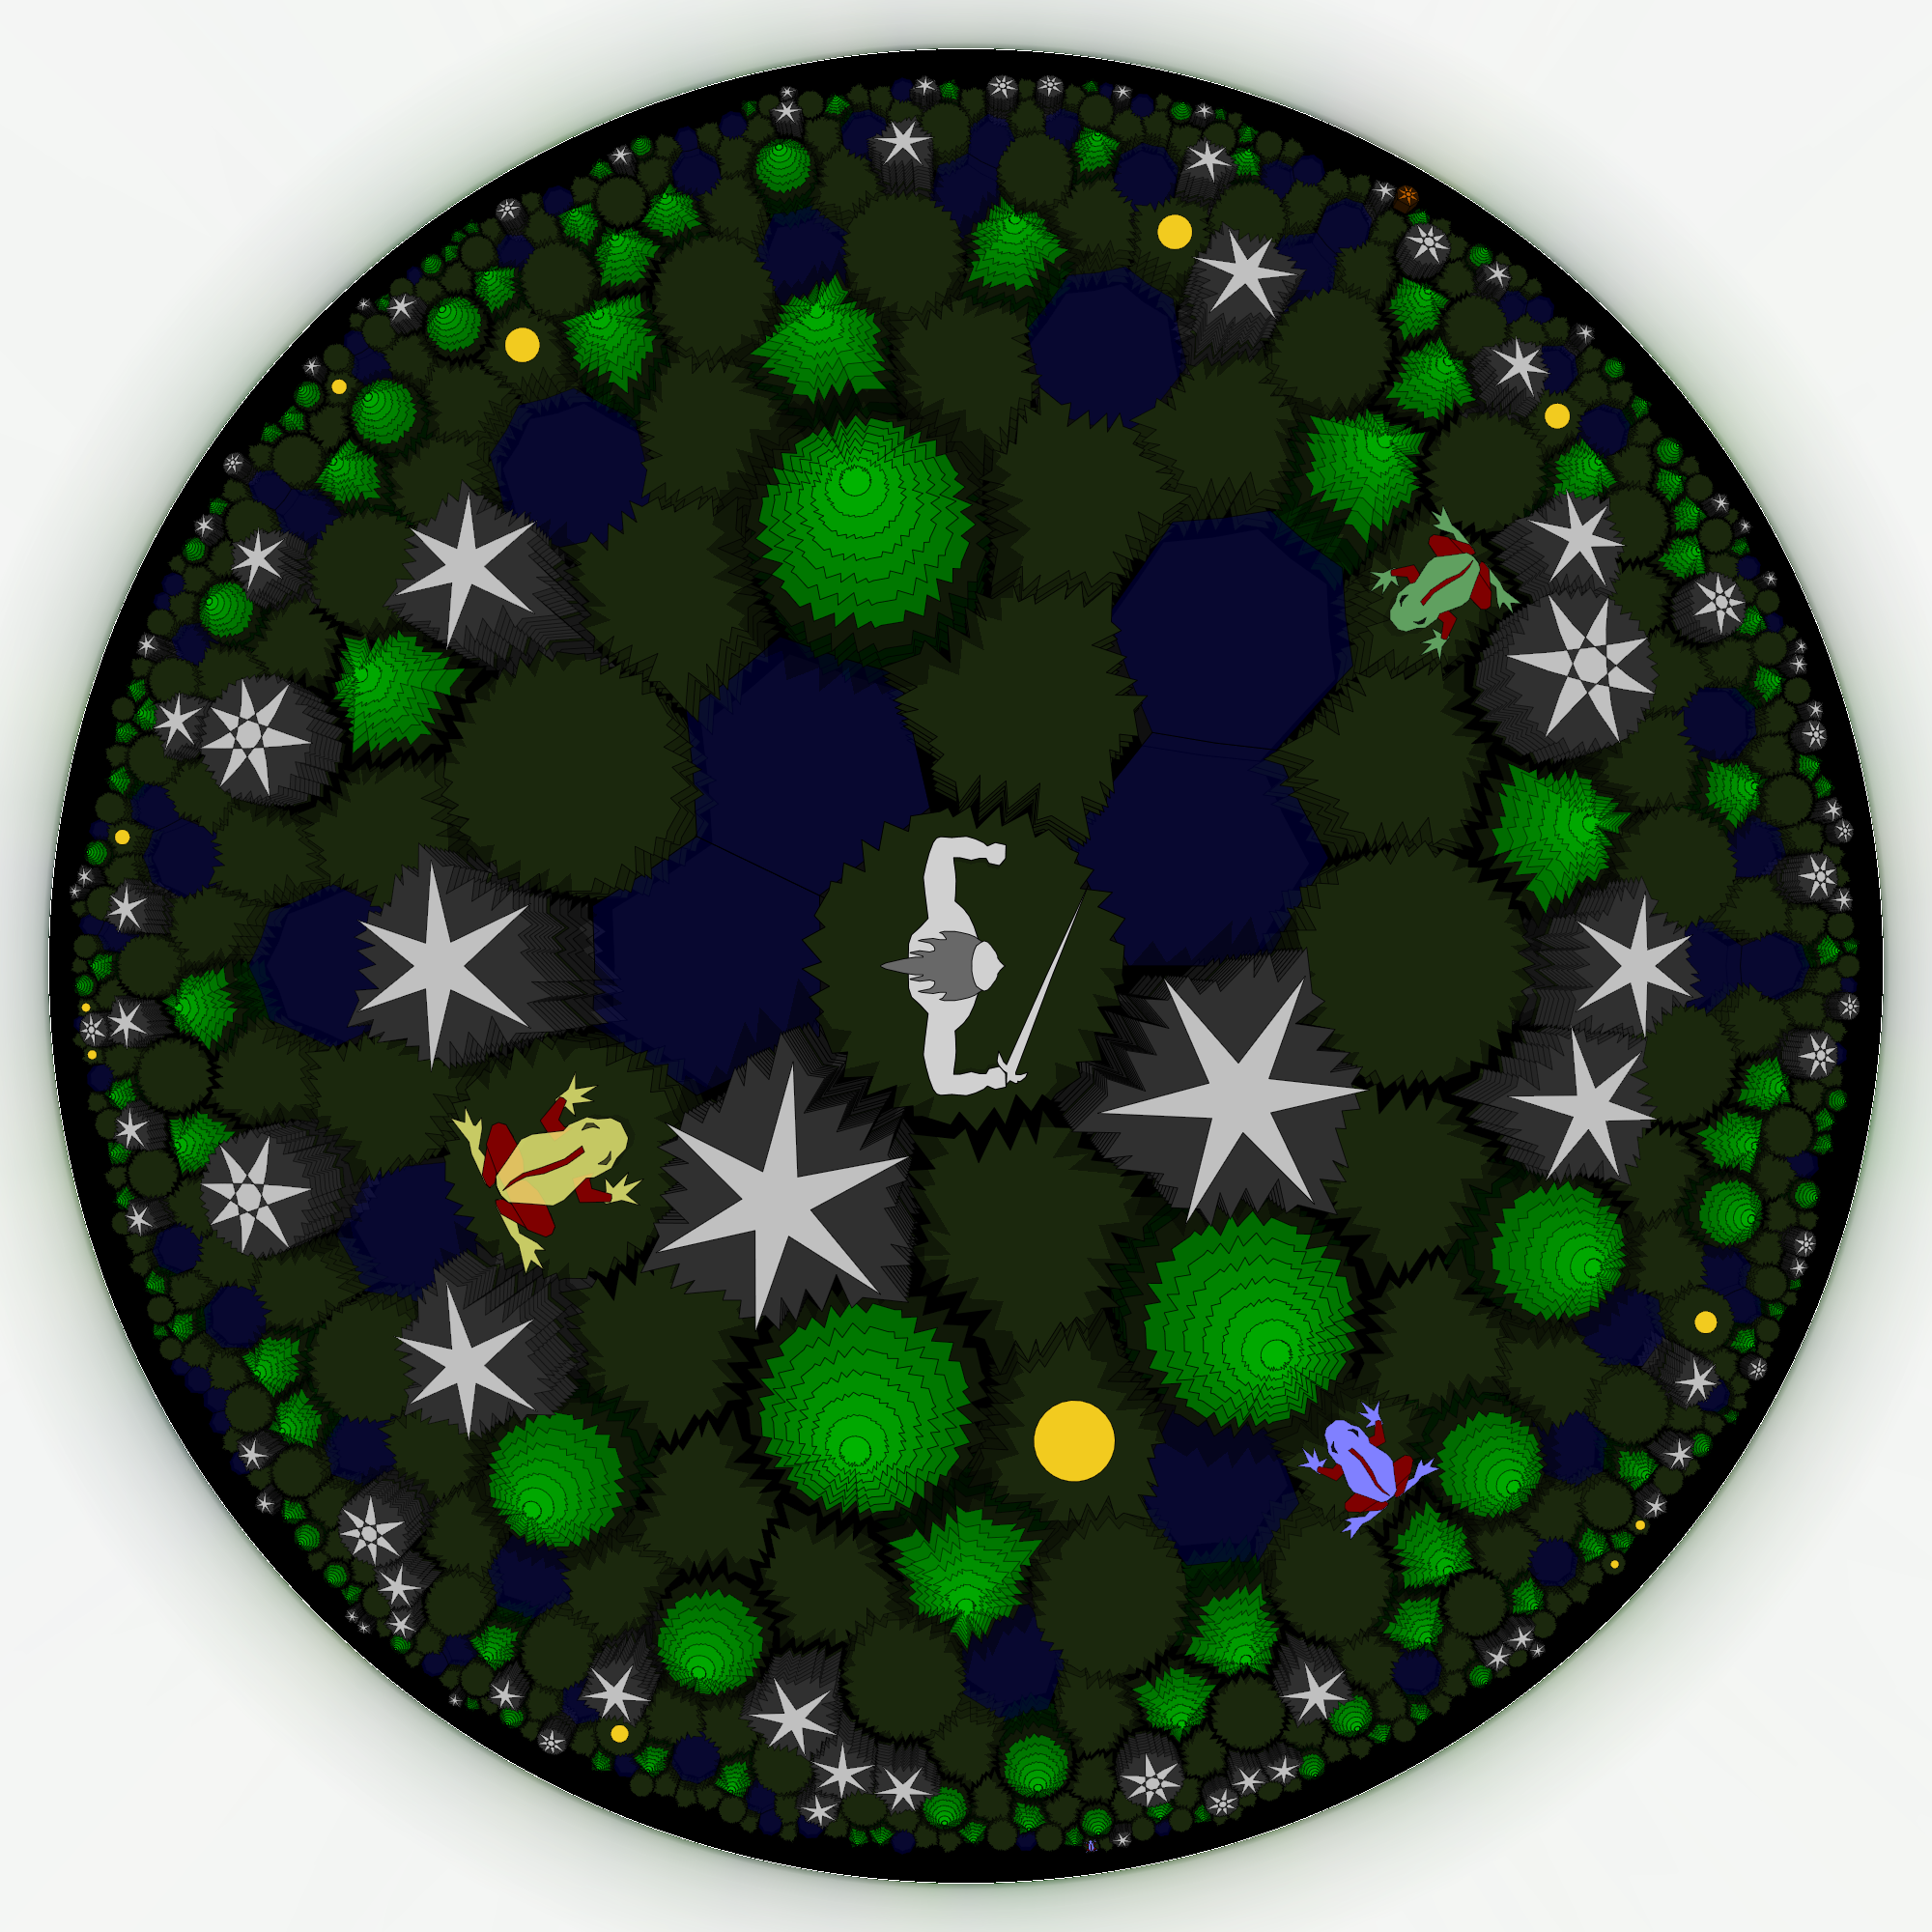 frogpond1